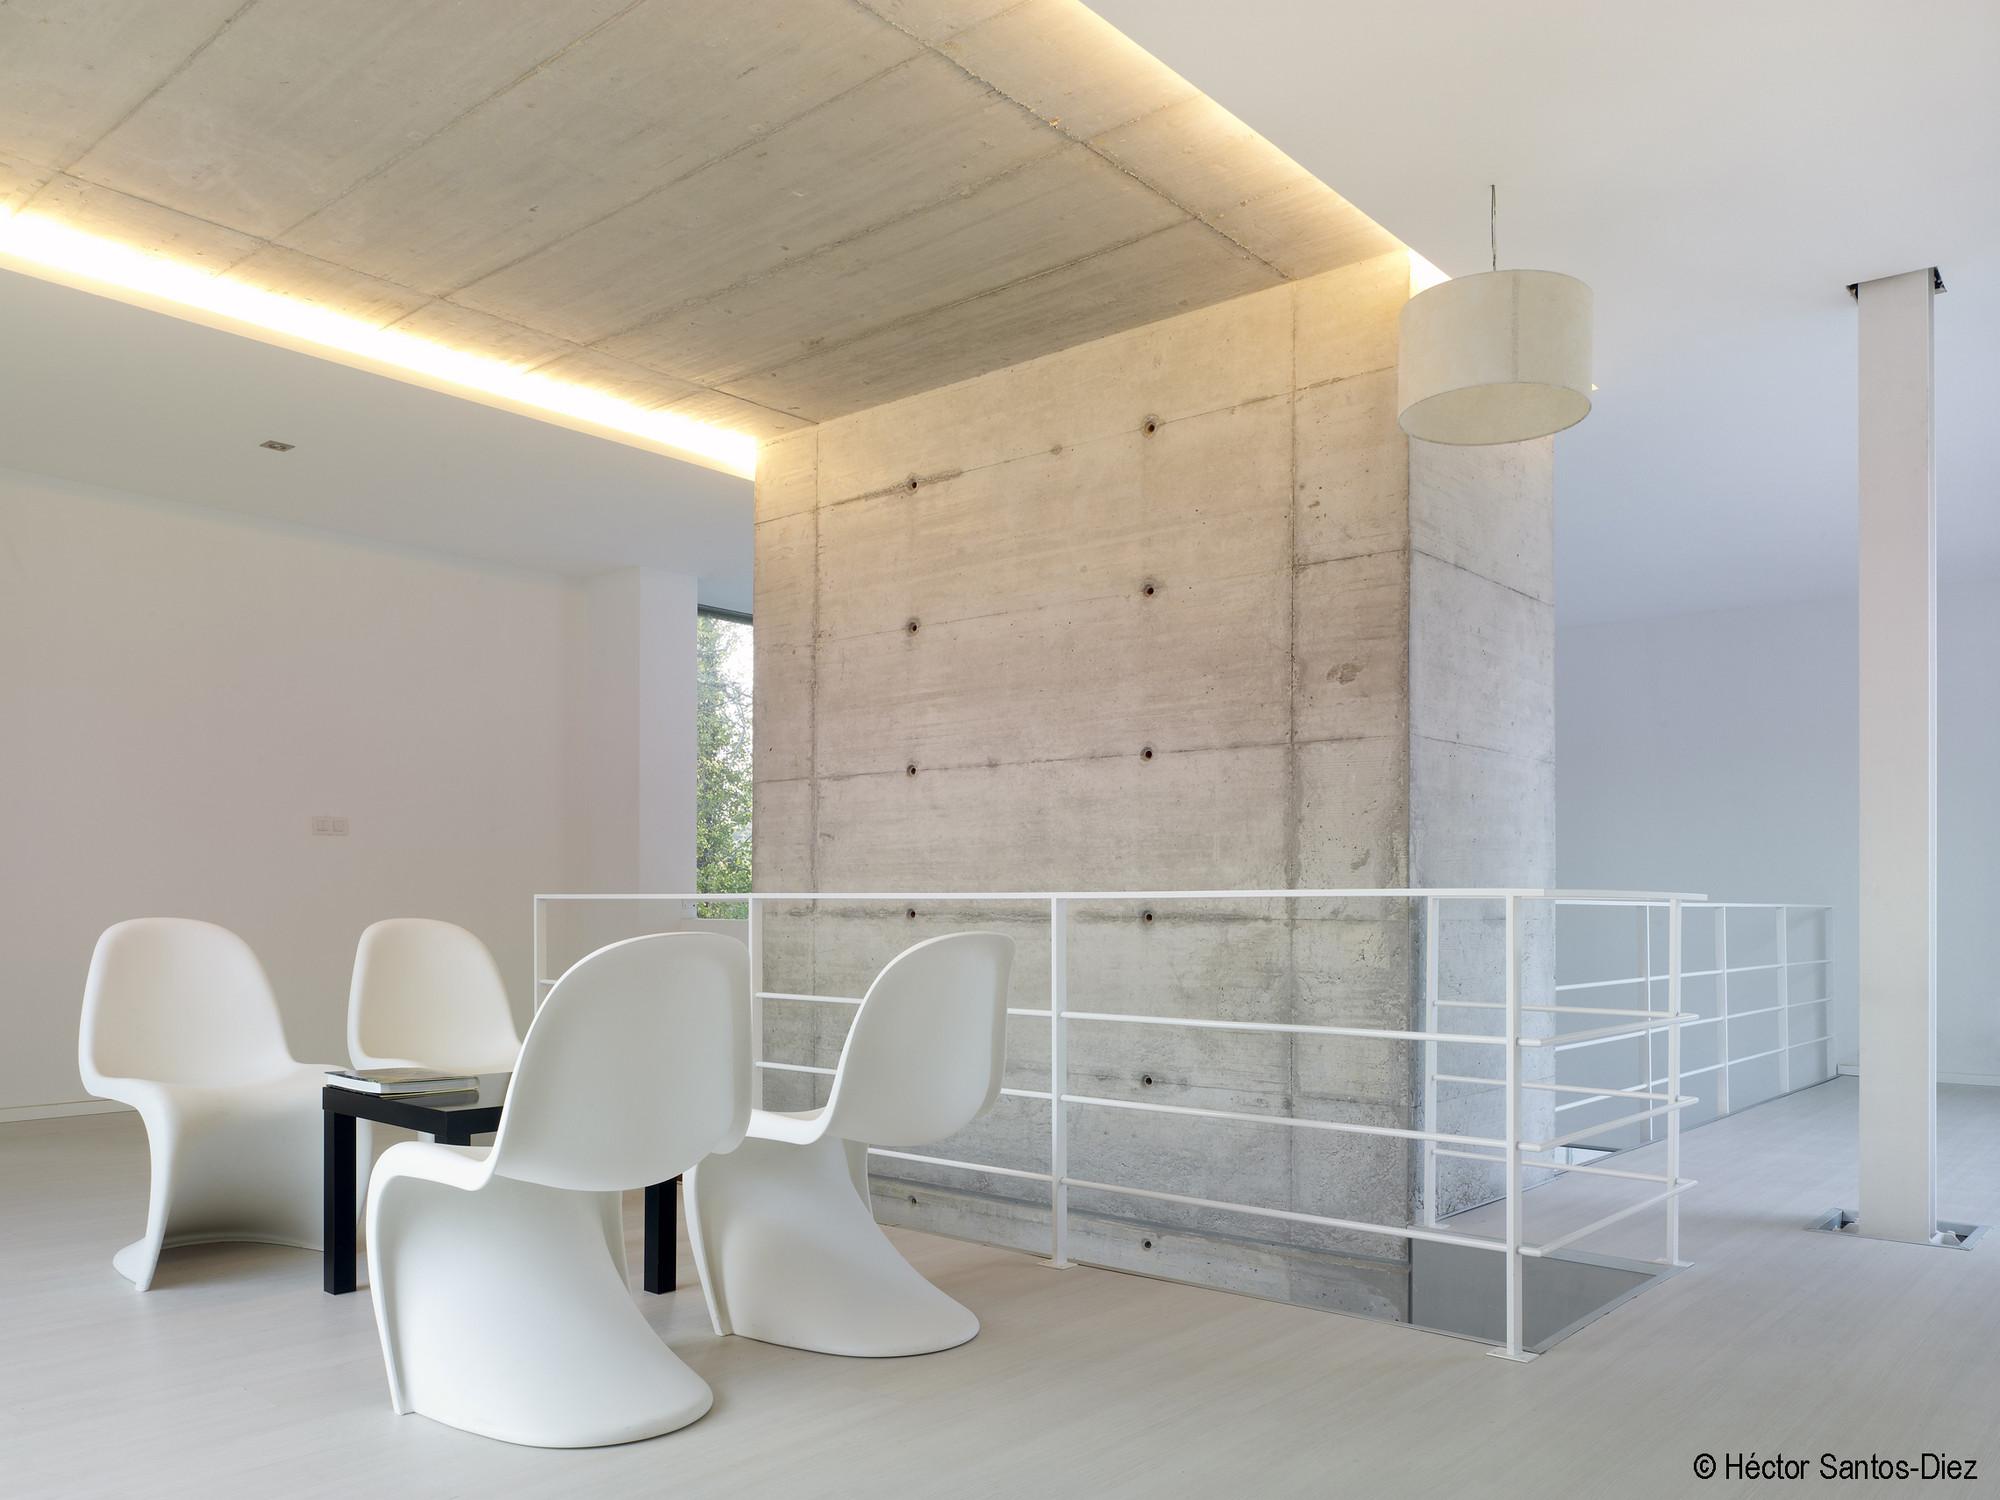 Gallery of EINS House / Óscar Pedrós